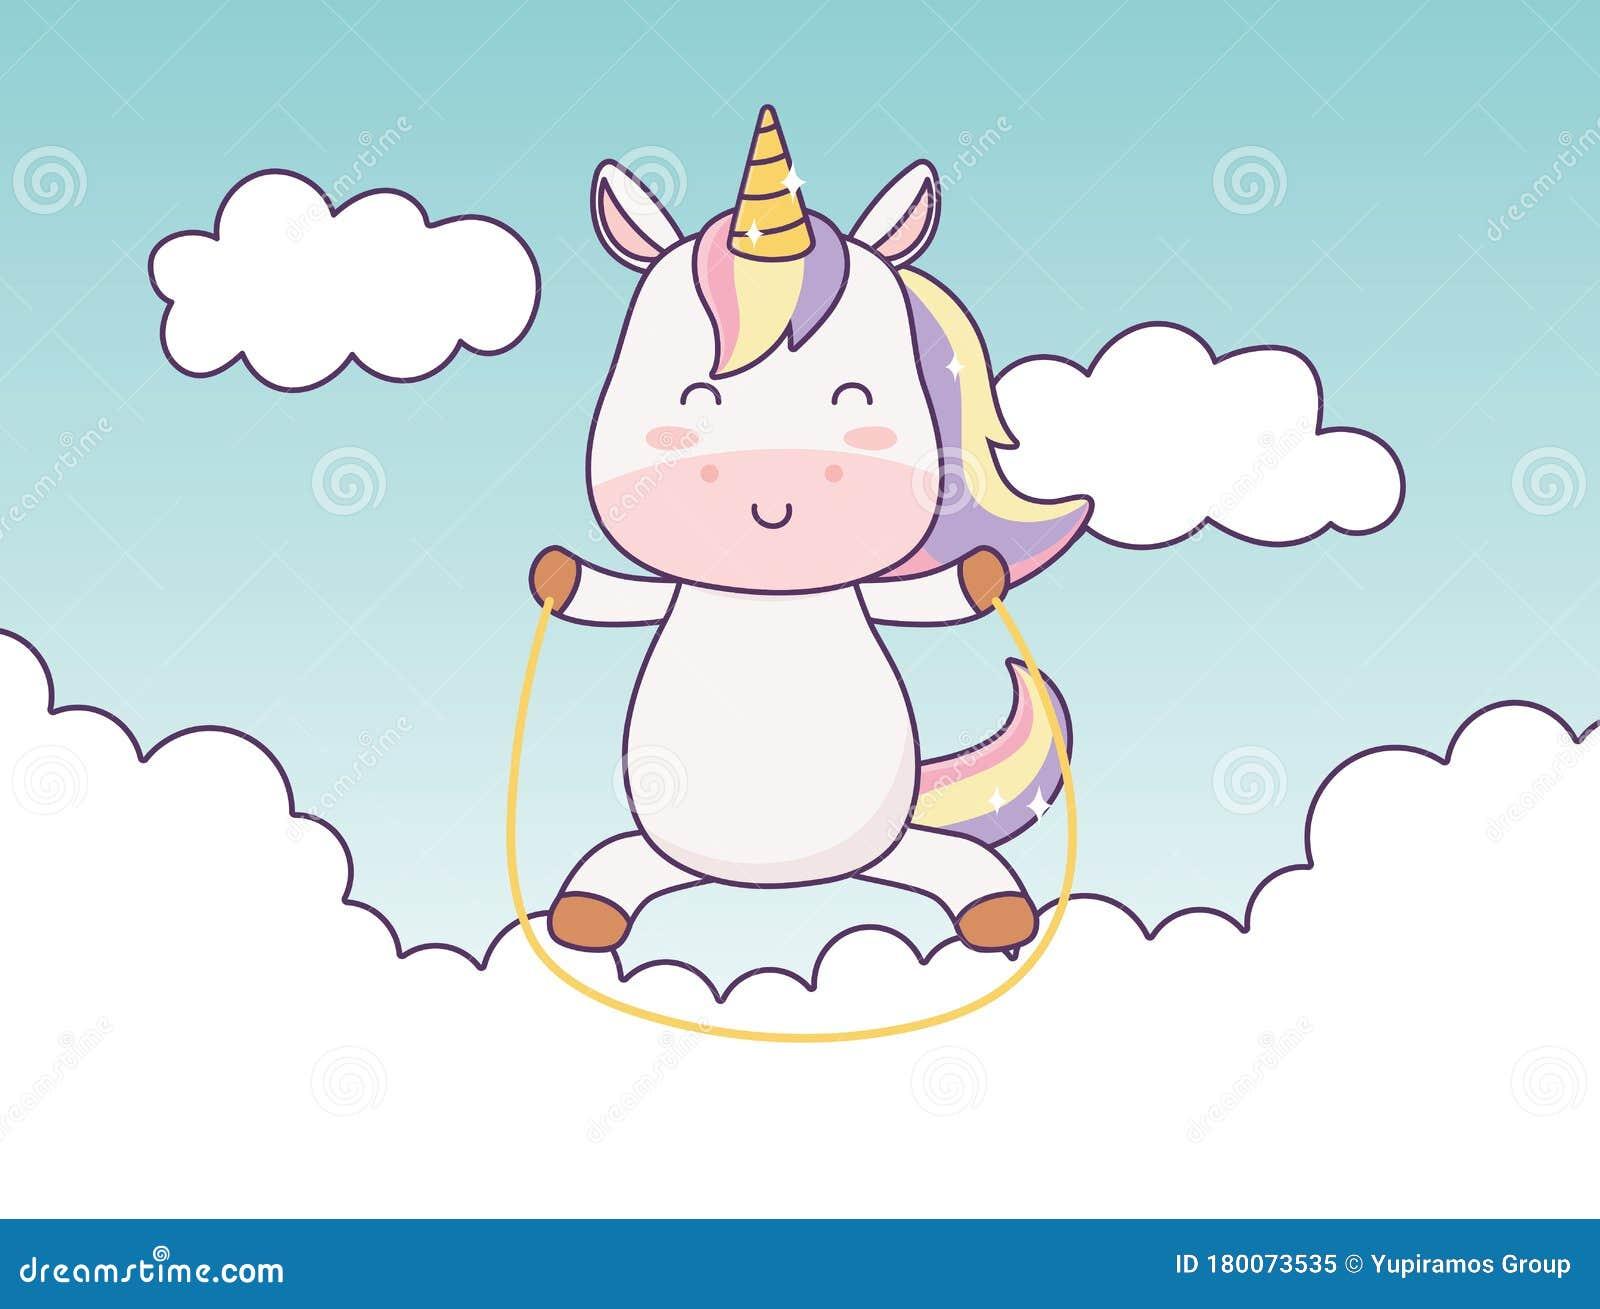 kawaii einhorn spielen in wolken himmelskartoon charakter